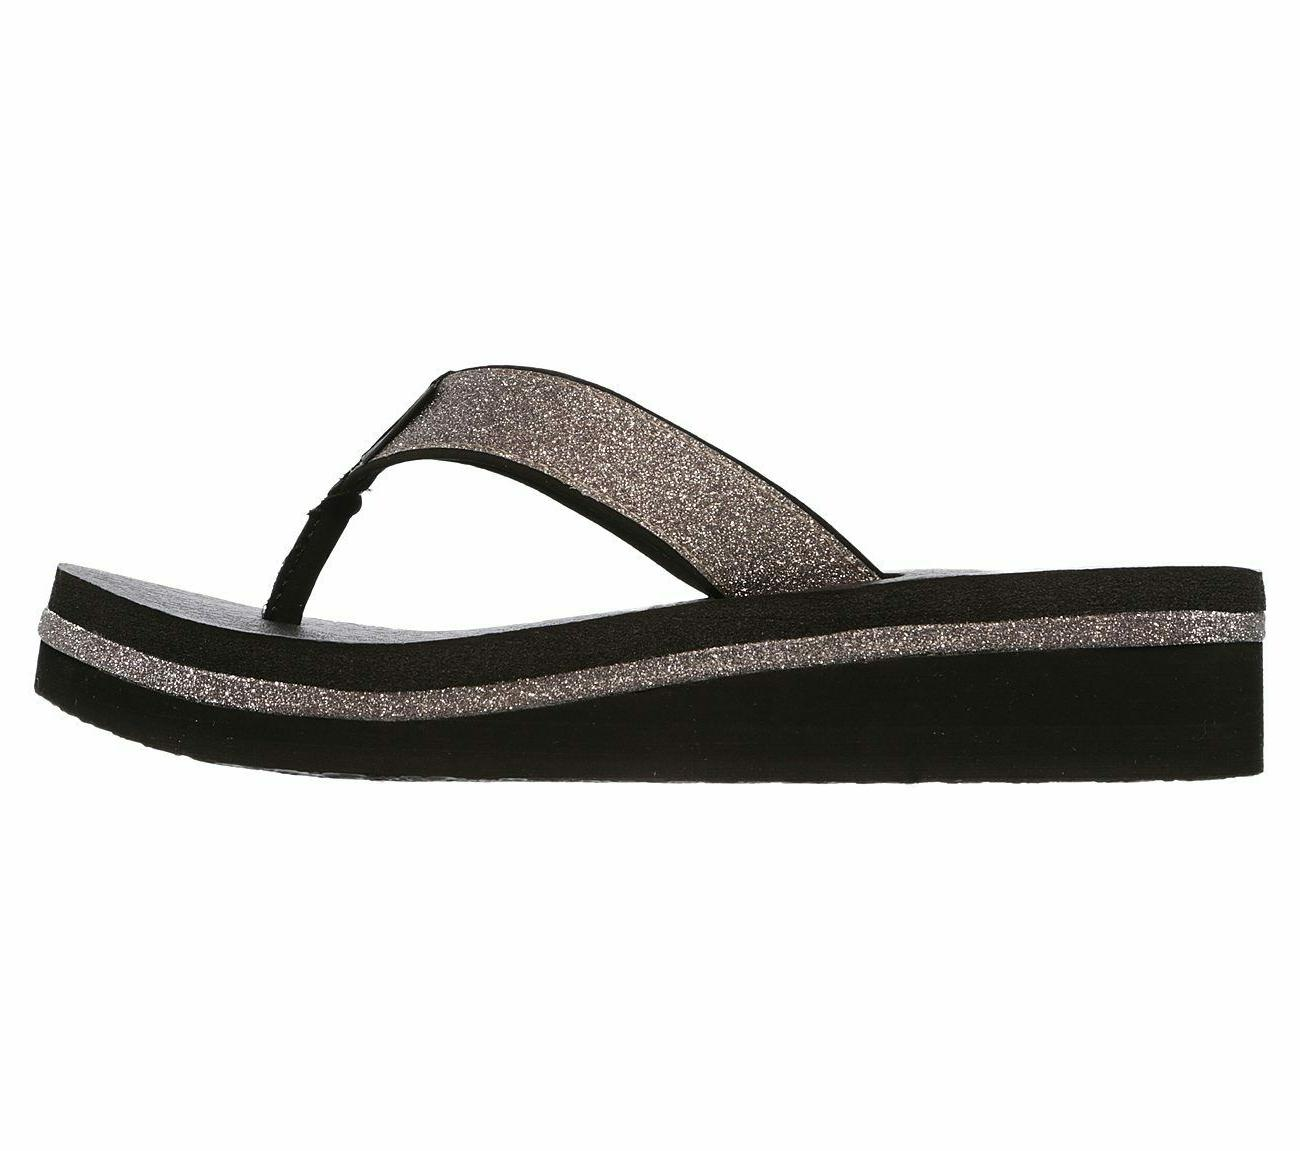 Skechers Women's Unicorn Micro Sandals Silver 9